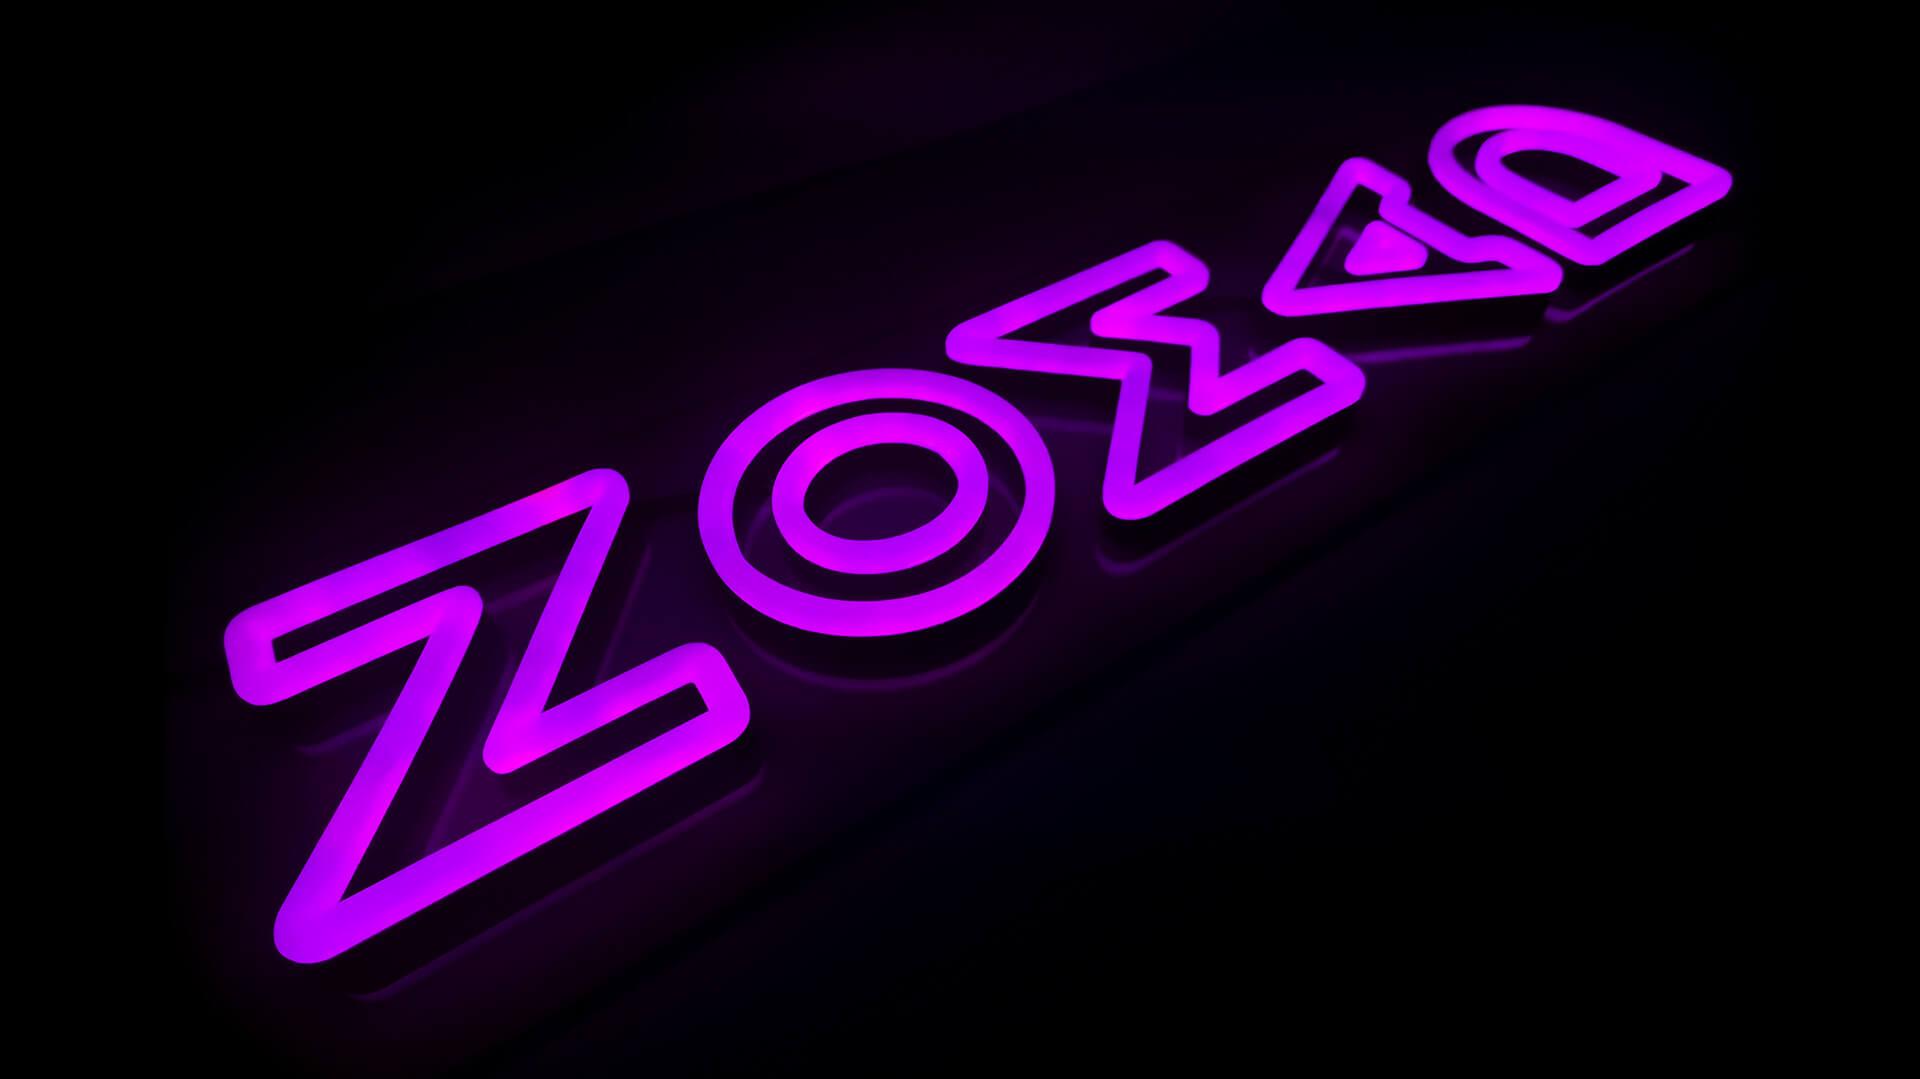 Pink RGB custom logo neon sign